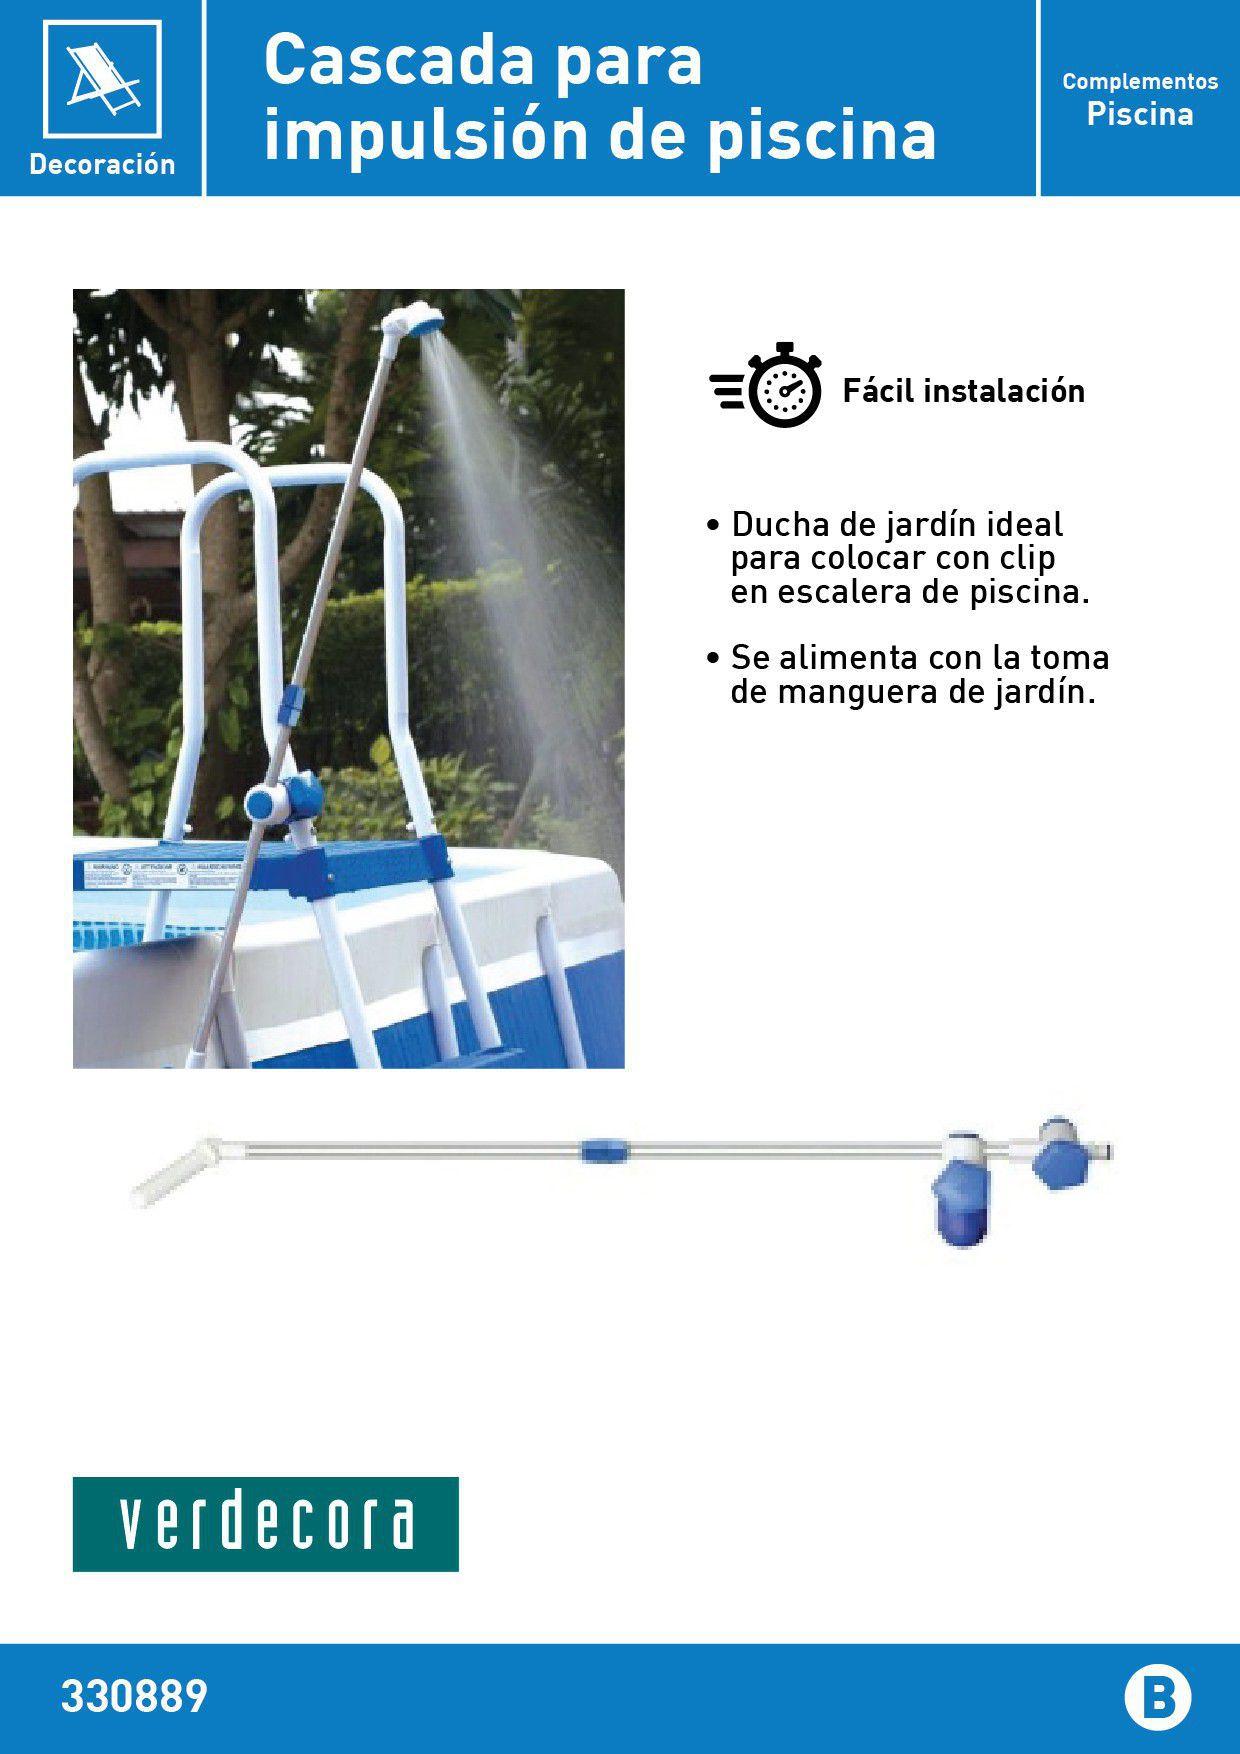 ducha clip para piscina